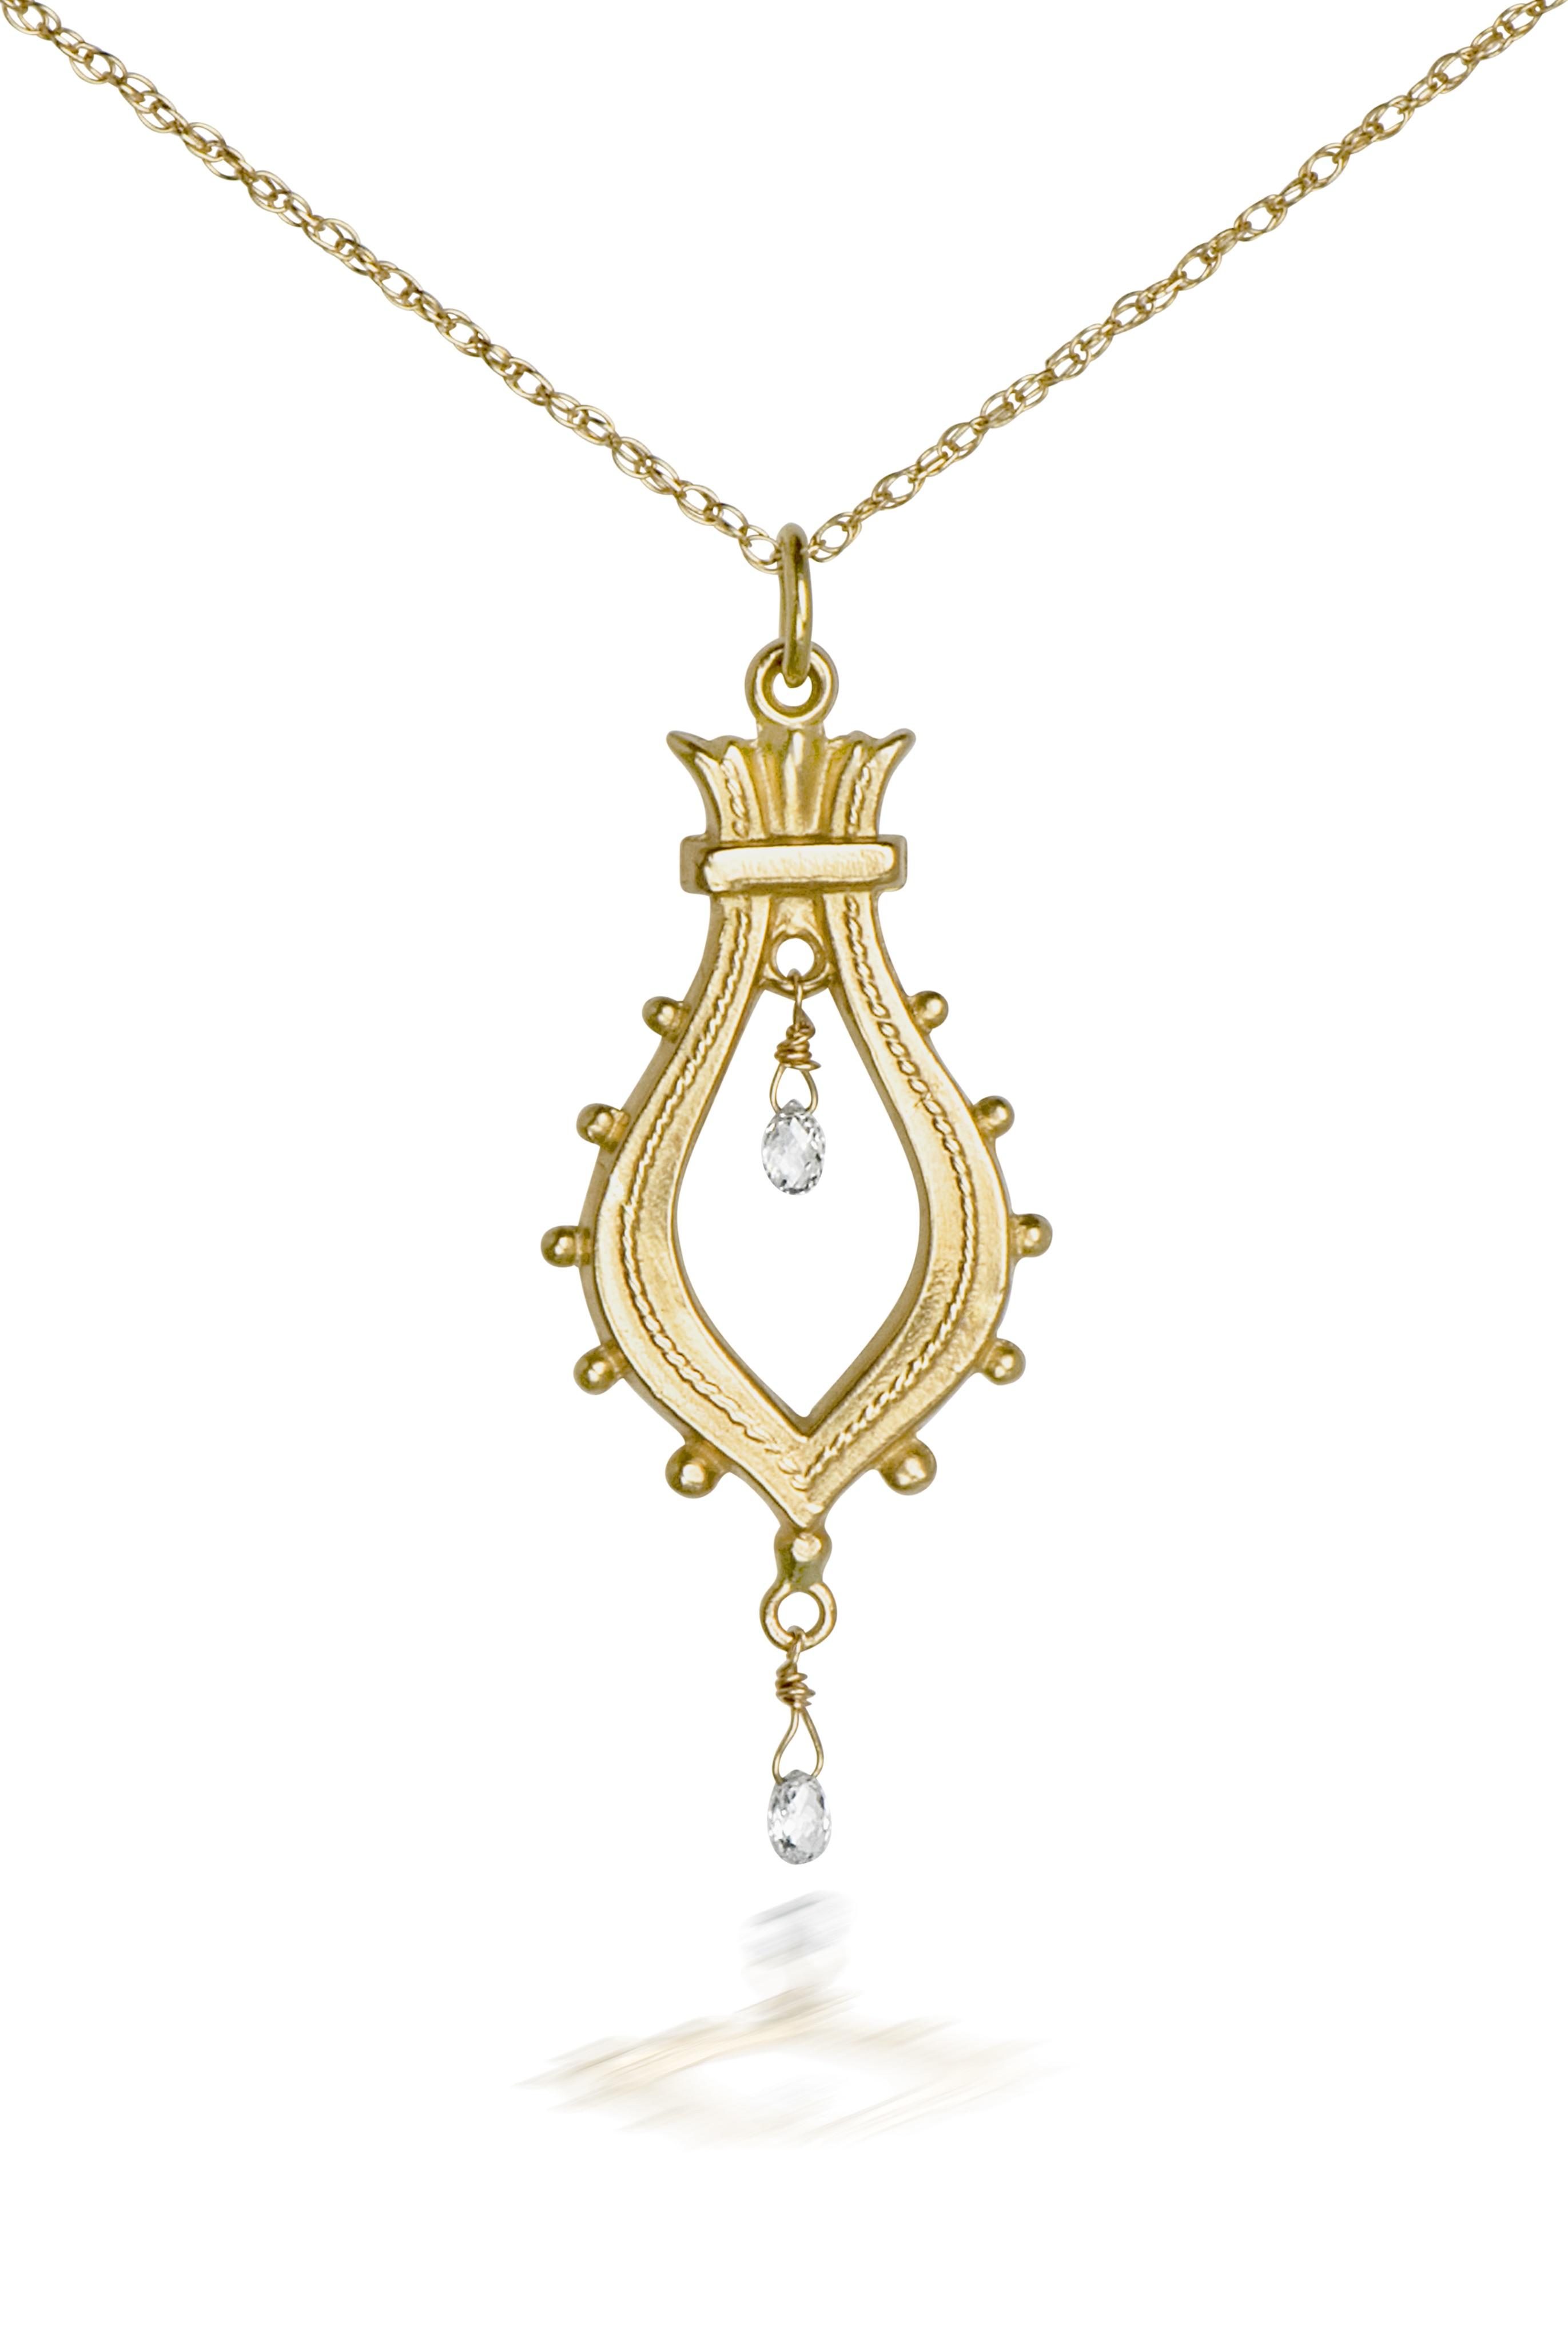 The Jewel - Just Jules - Lookbook - Gold Drop Necklace